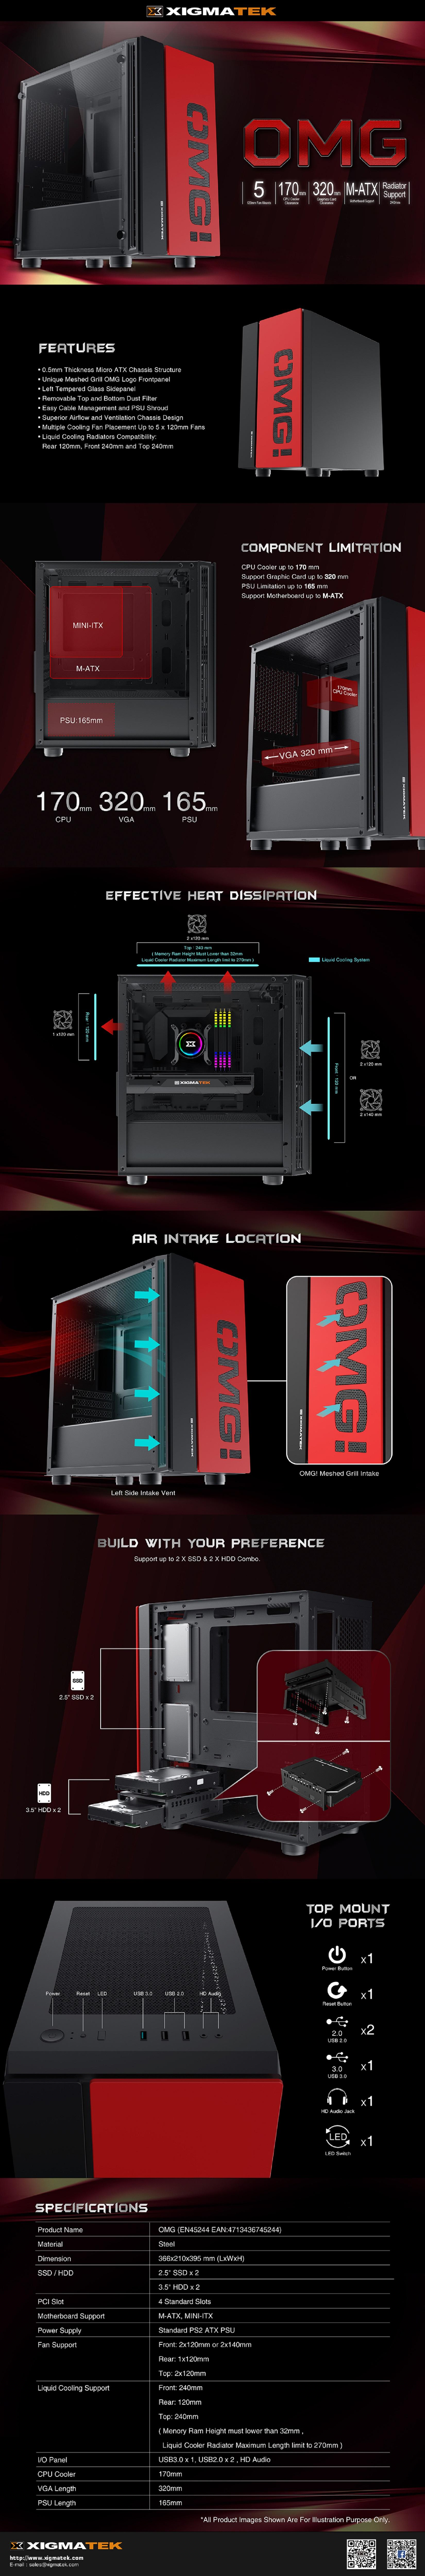 Case Xigmatek OMG (Mini-Tower/Màu Đen,Đỏ) giới thiệu